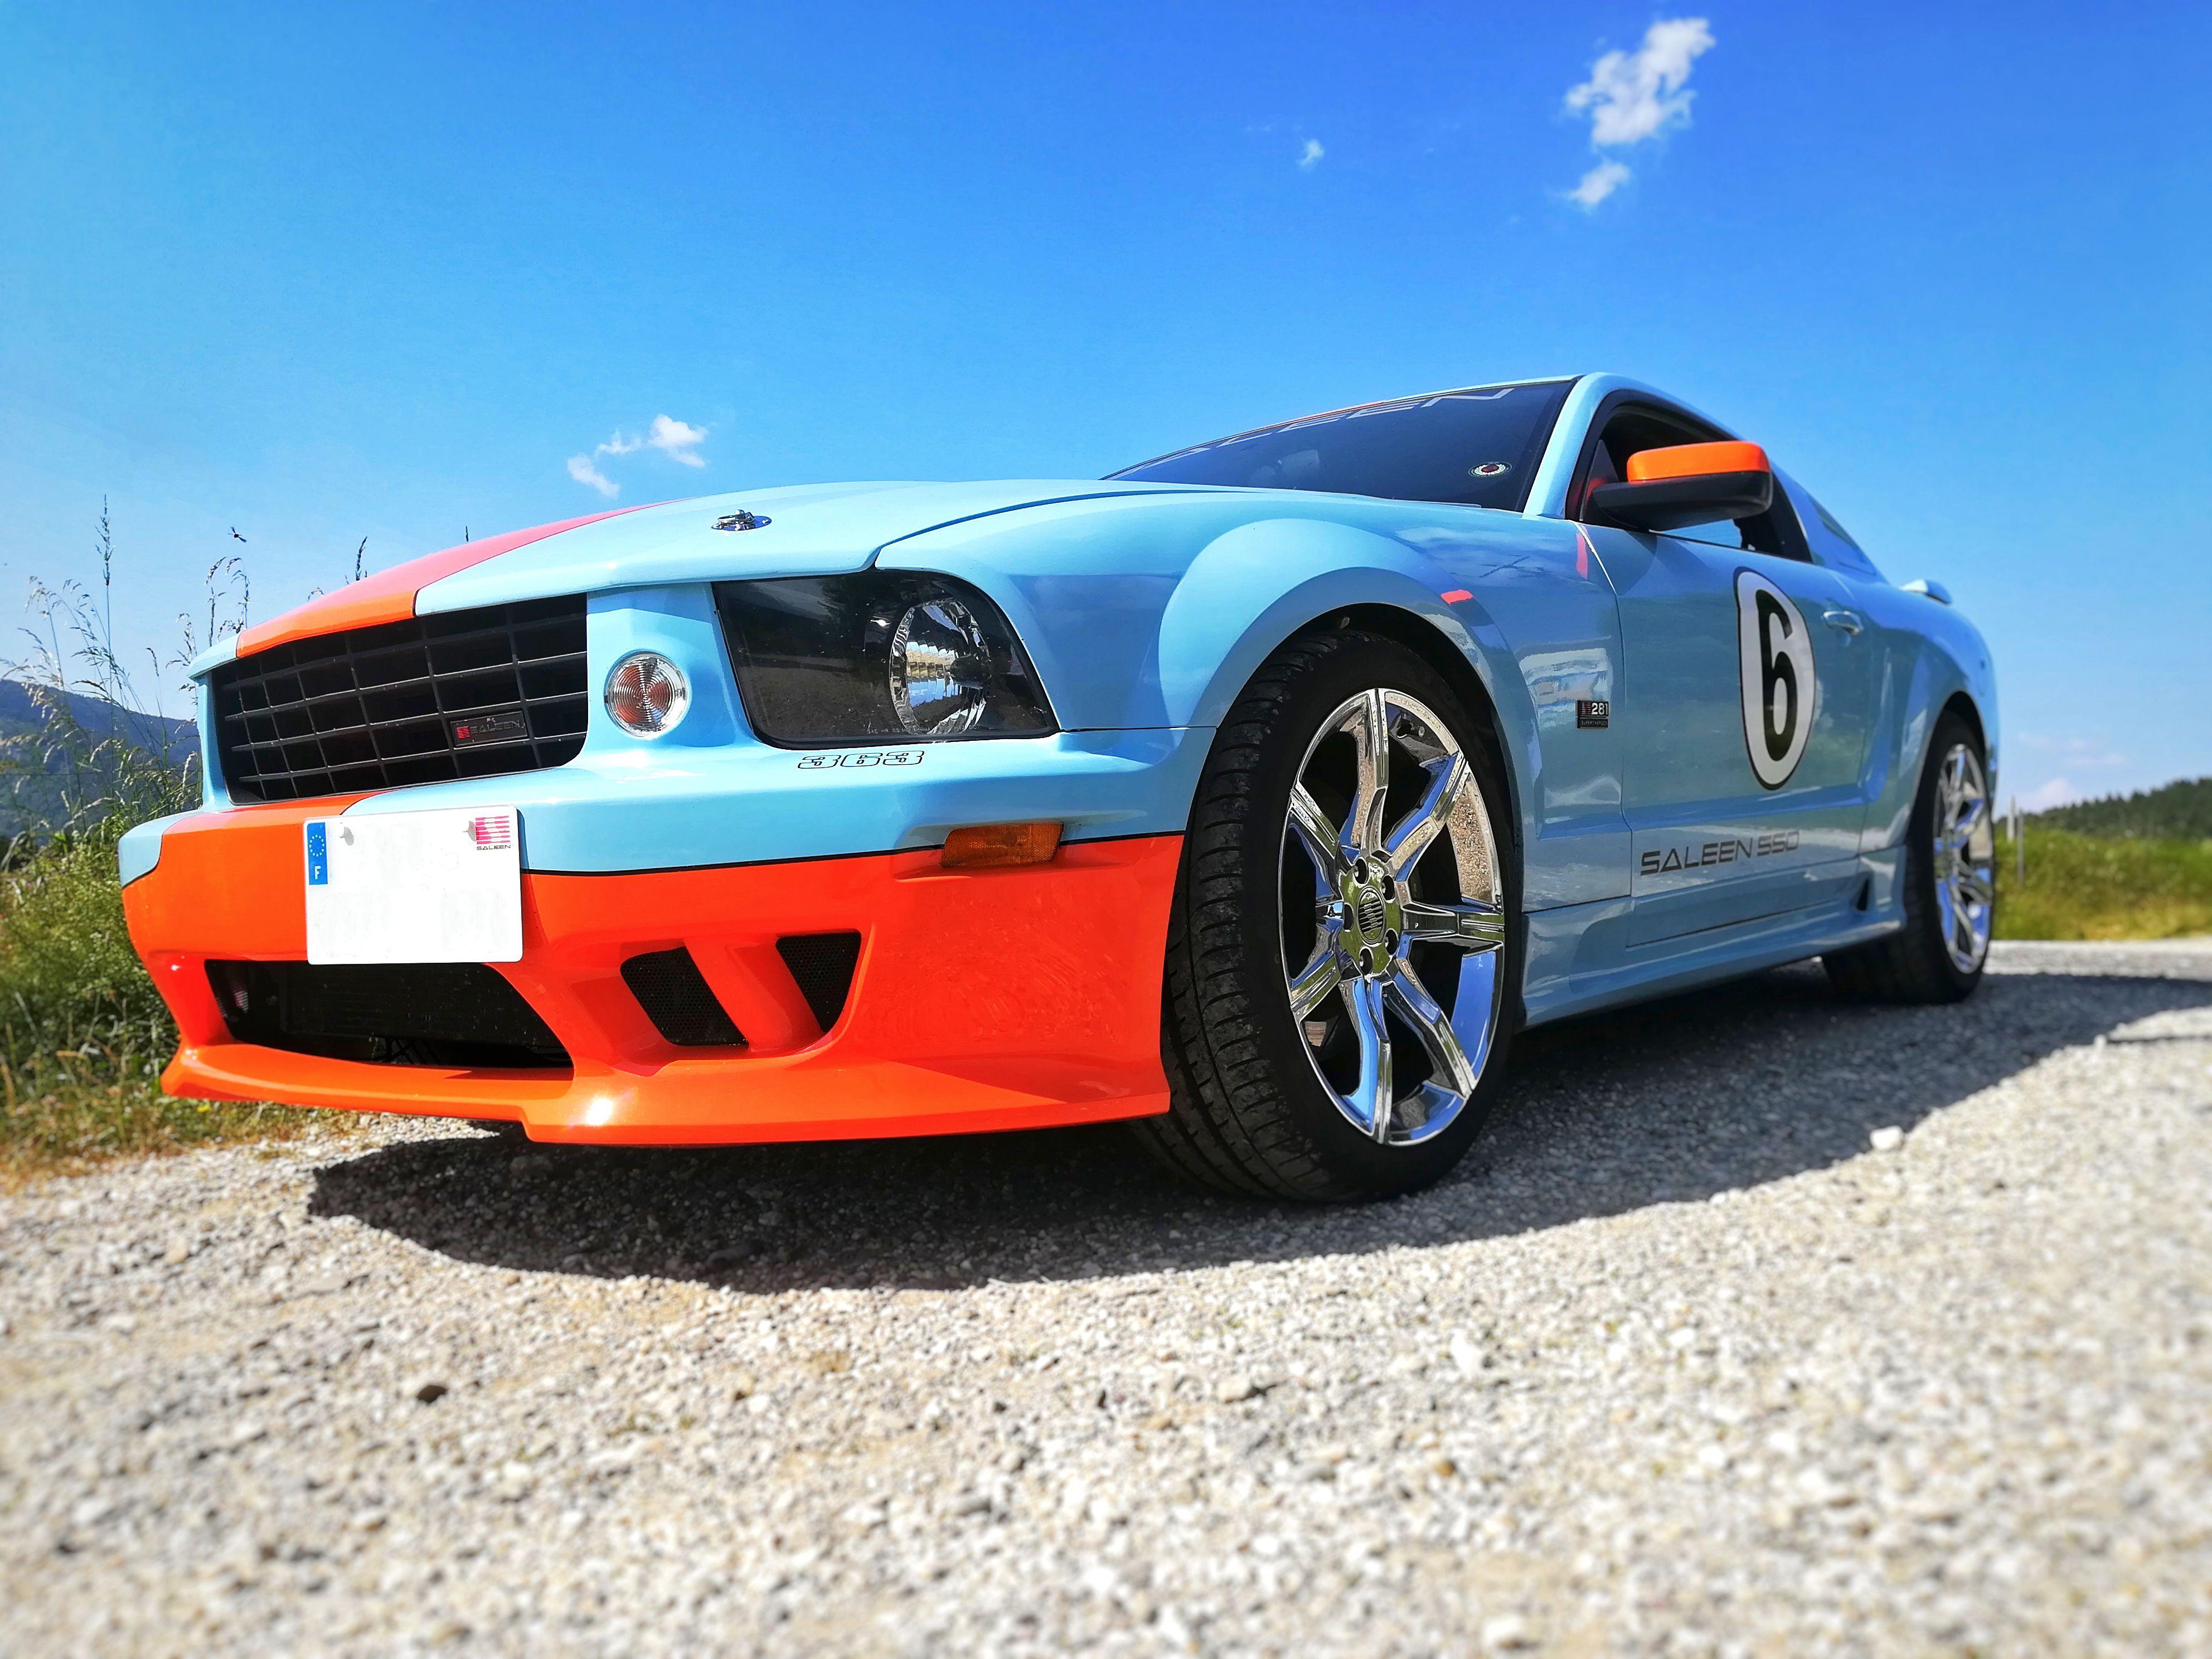 Mustang Saleen Sc 281 2006 Gulf Livery Saleen Mustang Mustang Sports Car